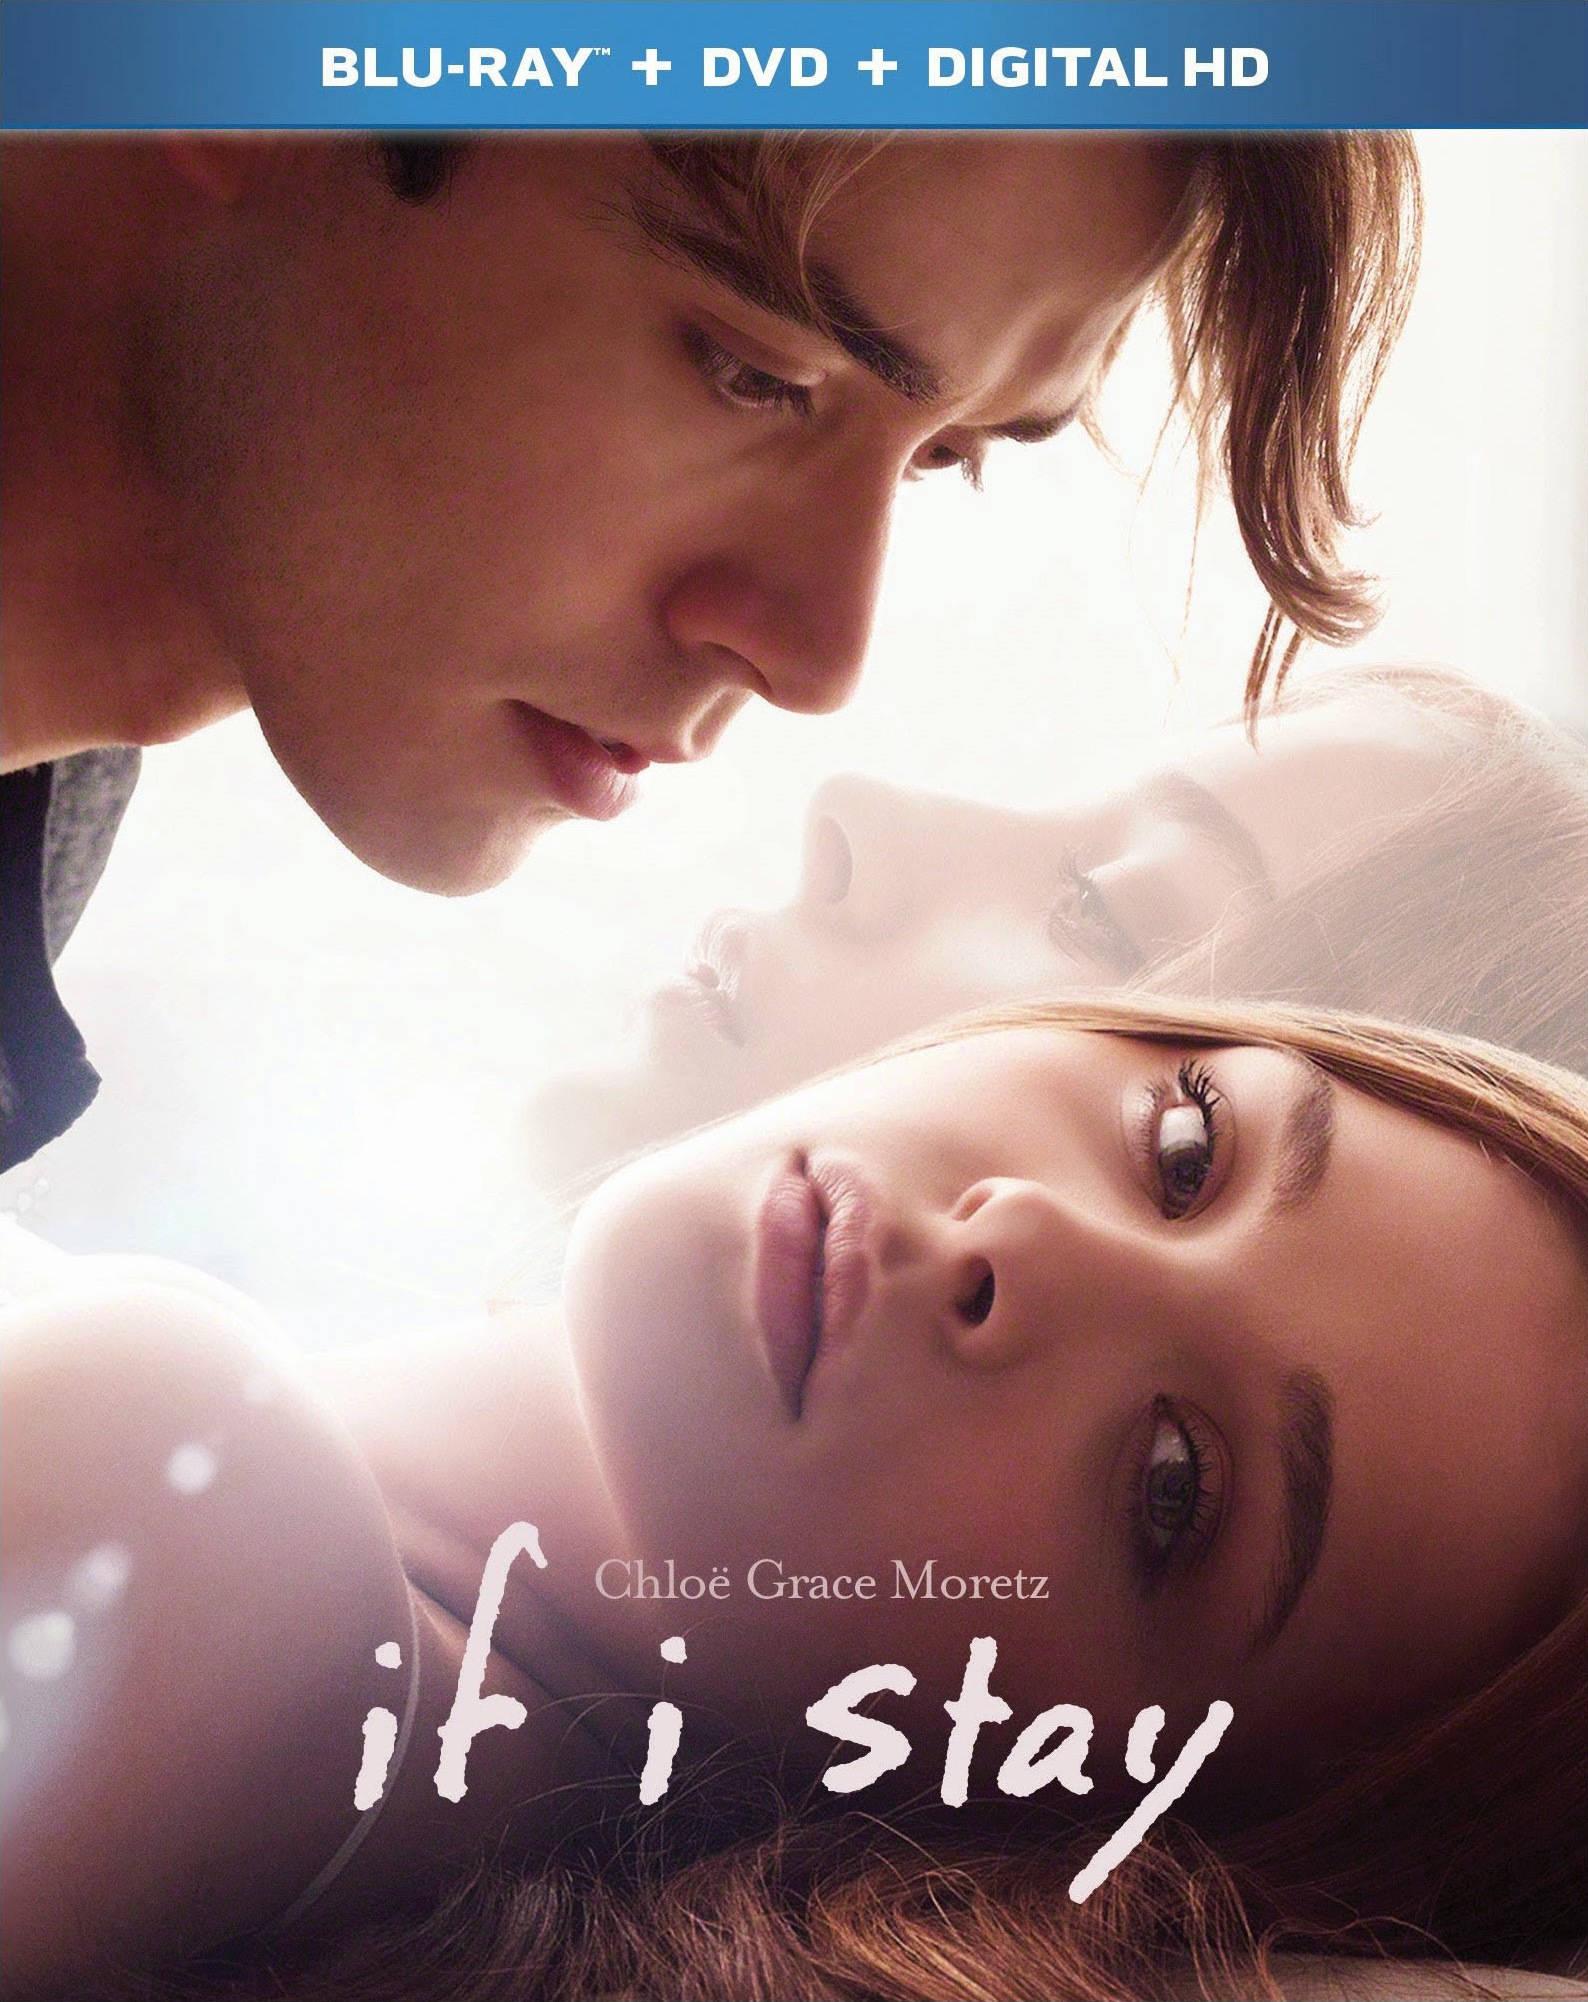 Если я останусь. Обложка с сайта imageshost.ru